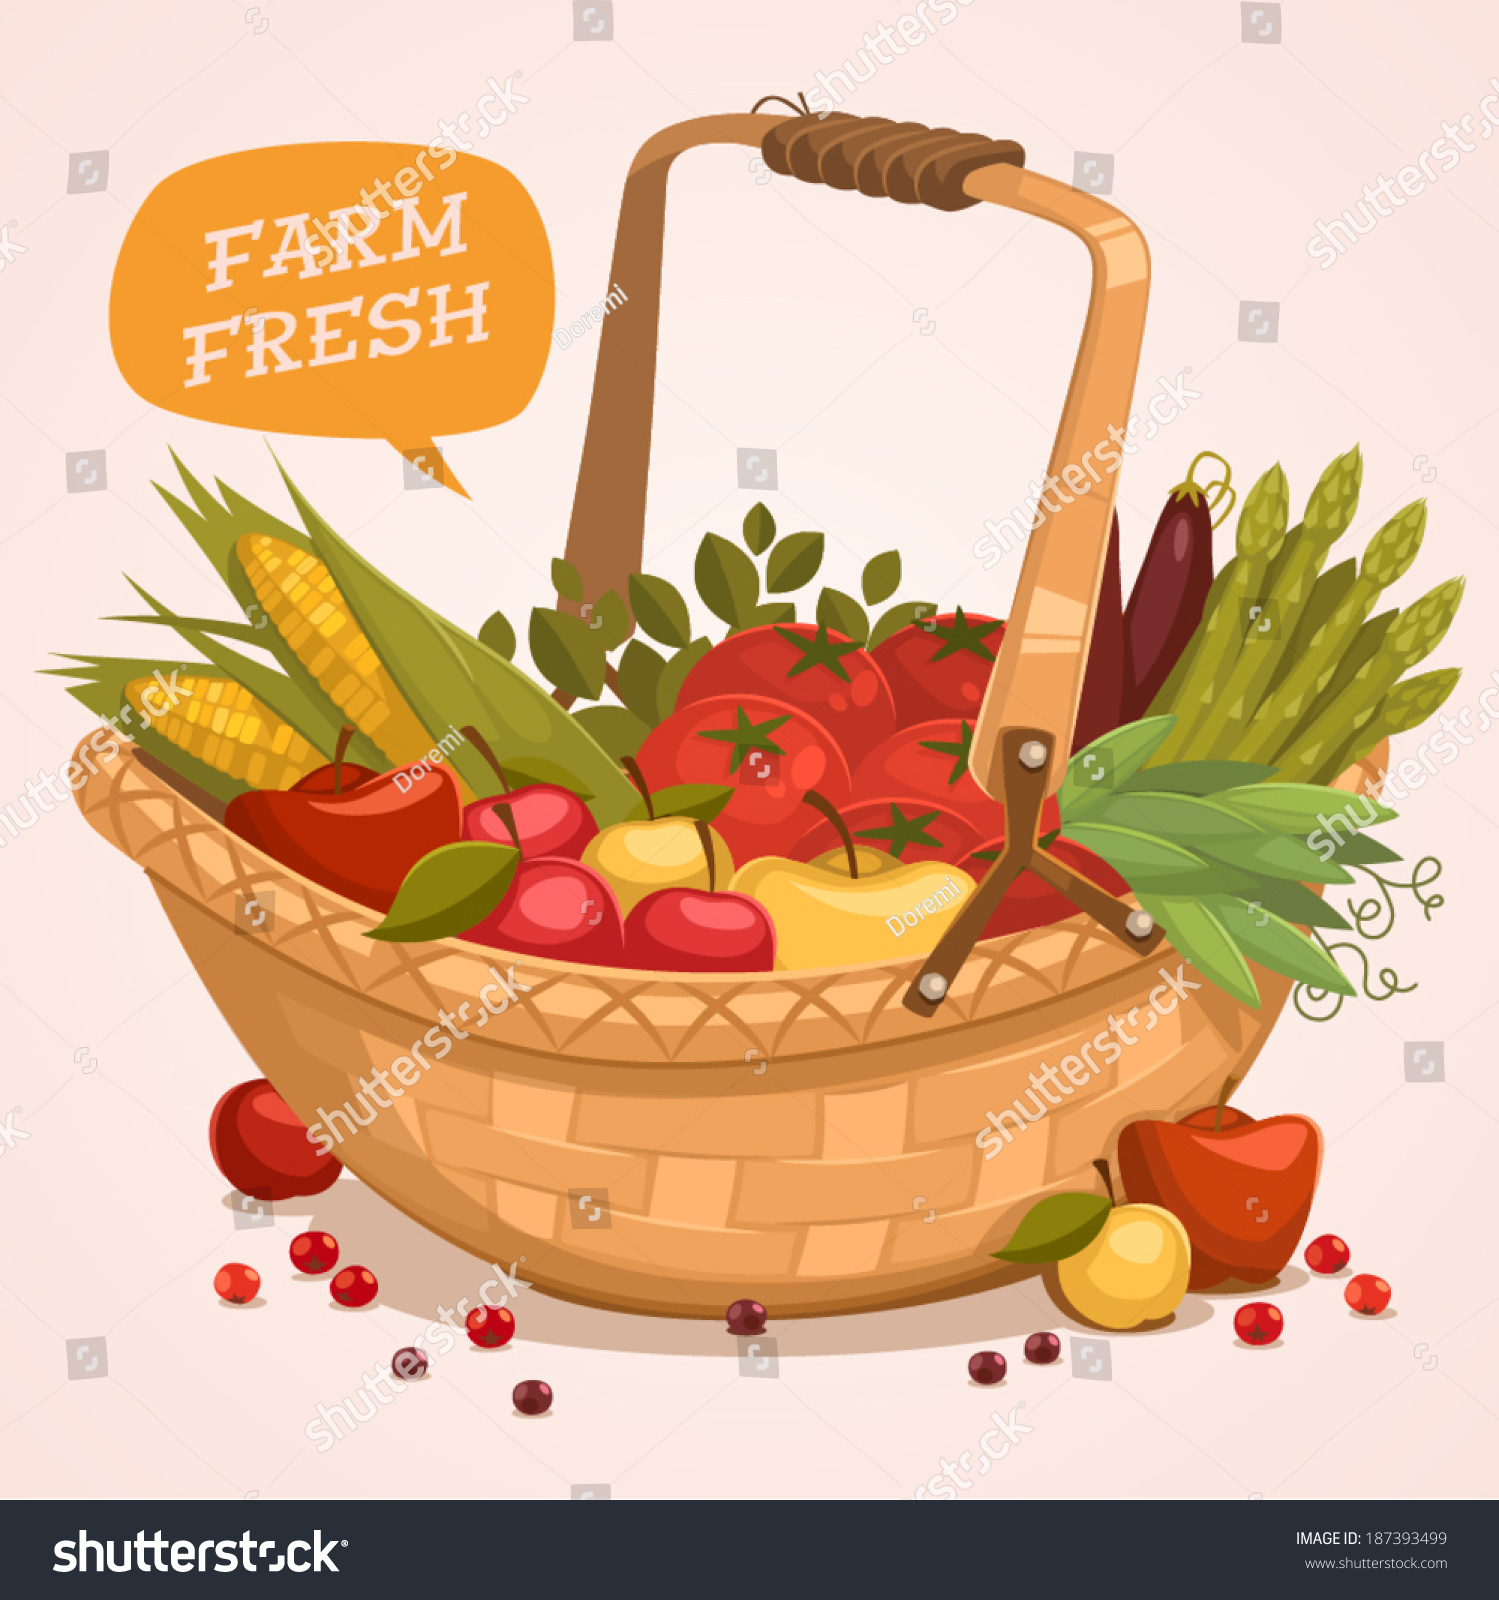 Fruit Basket Farm Fresh Retro Style Stock Vector 187393499